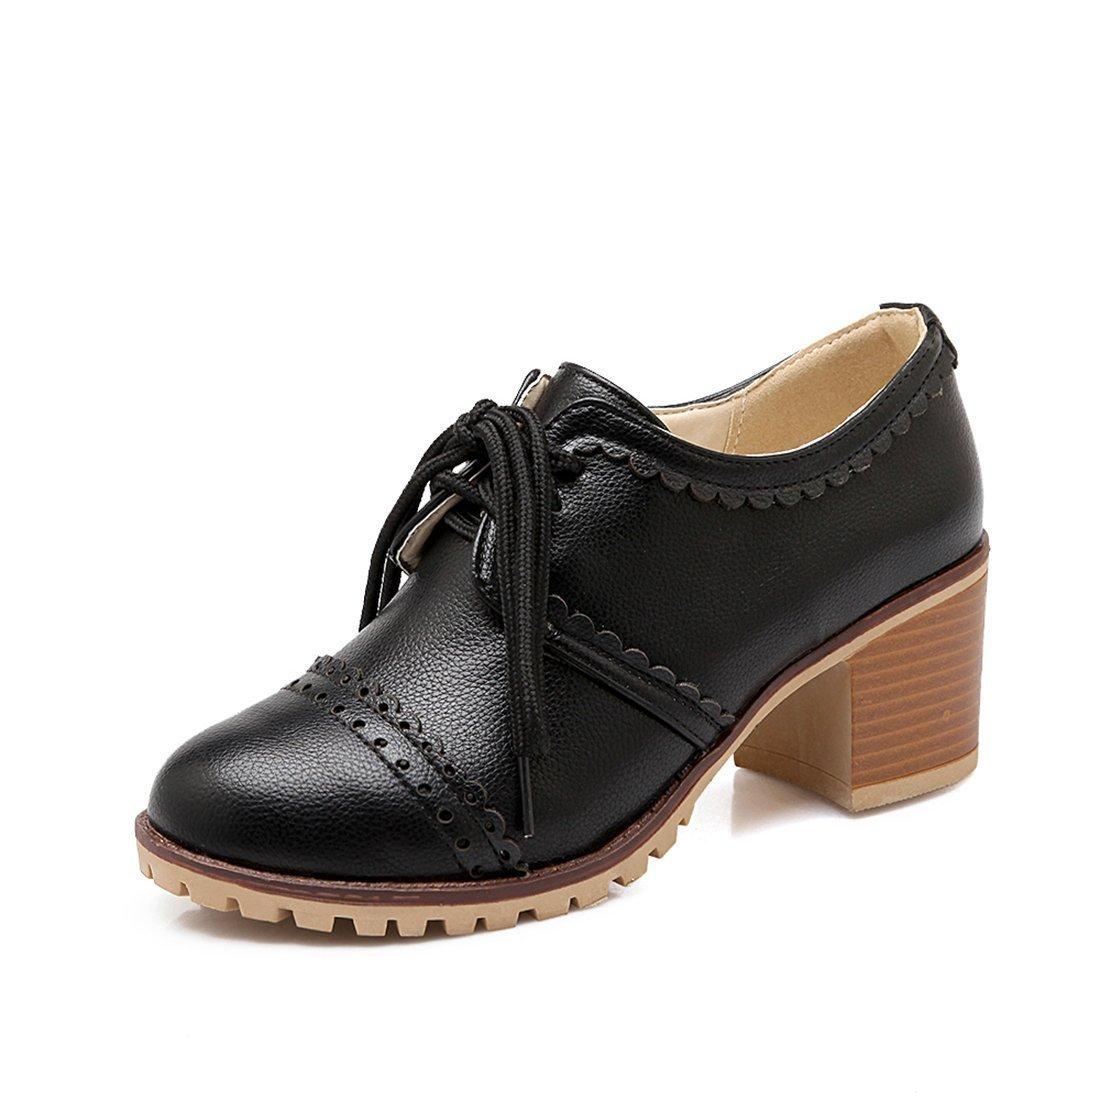 ac367708a607 Susanny Classic Retro Pu Oxfords Brogue Shoes Women's Mid-Heel Wingtip Lace  up Dress Black Shoes 5 B (M) US